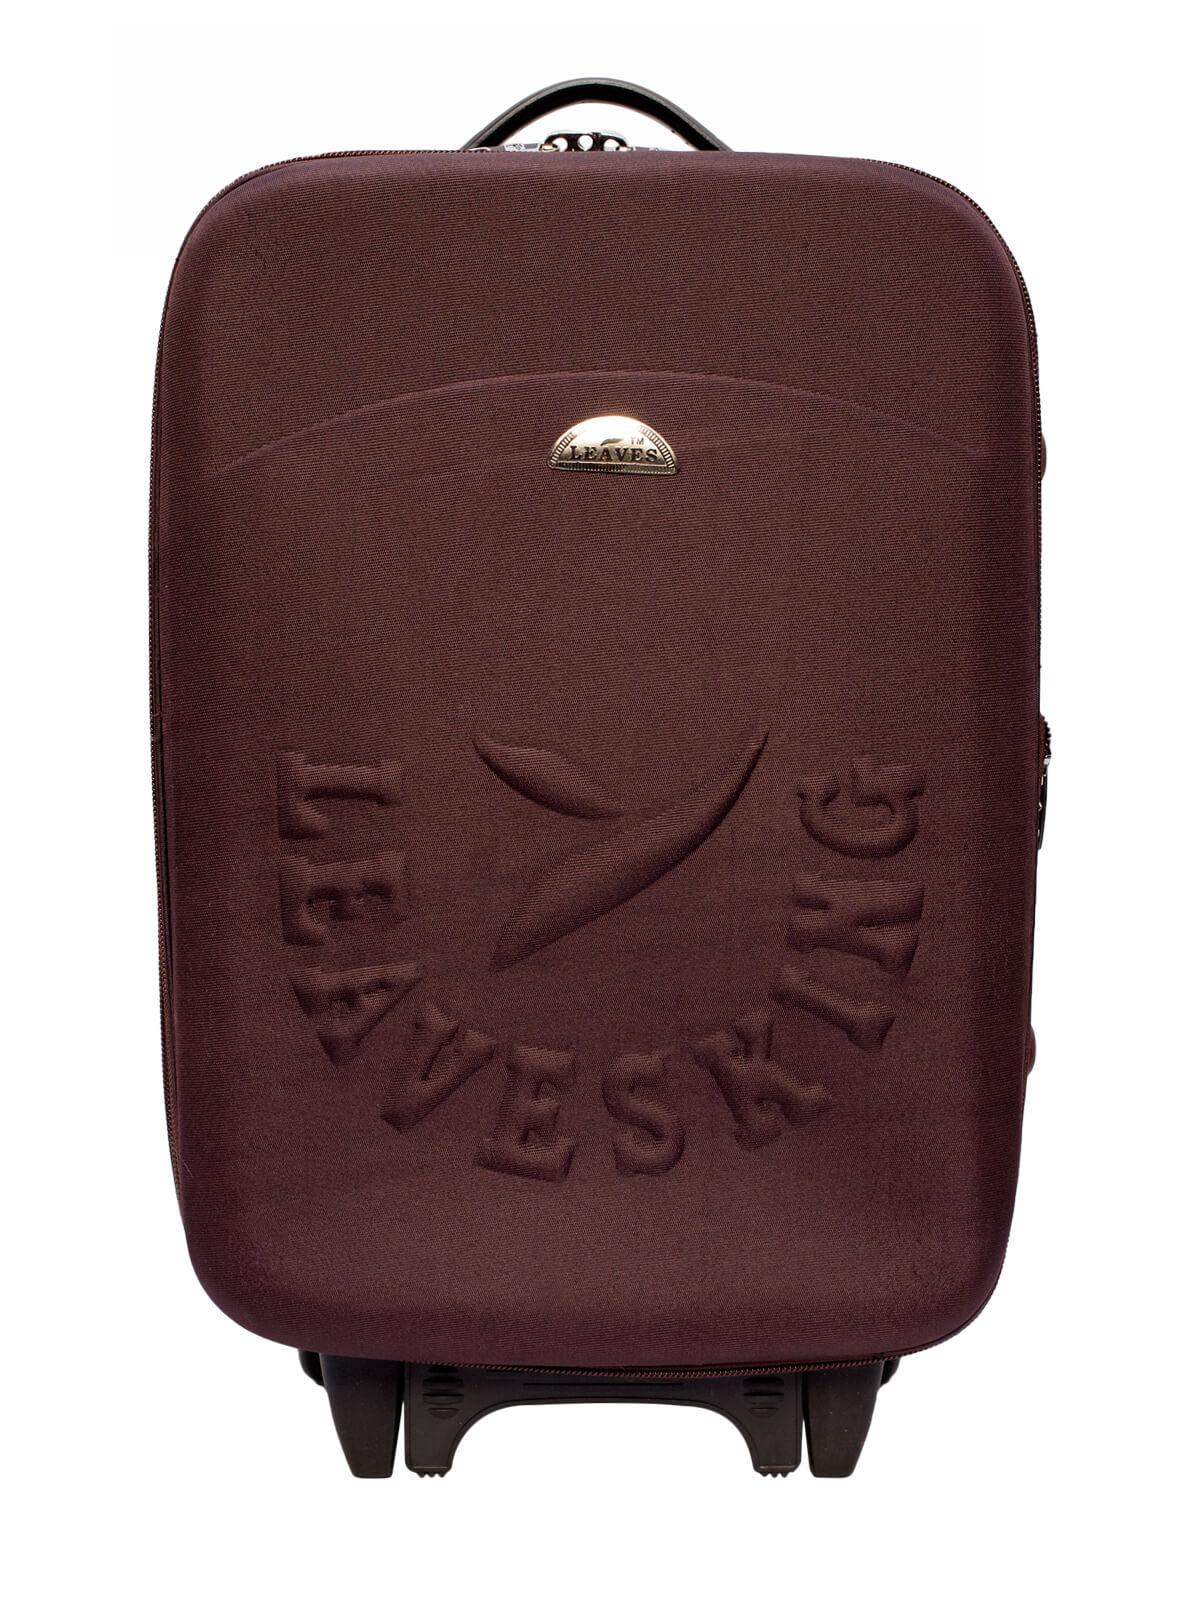 Coffee Hand Luggage Trolley